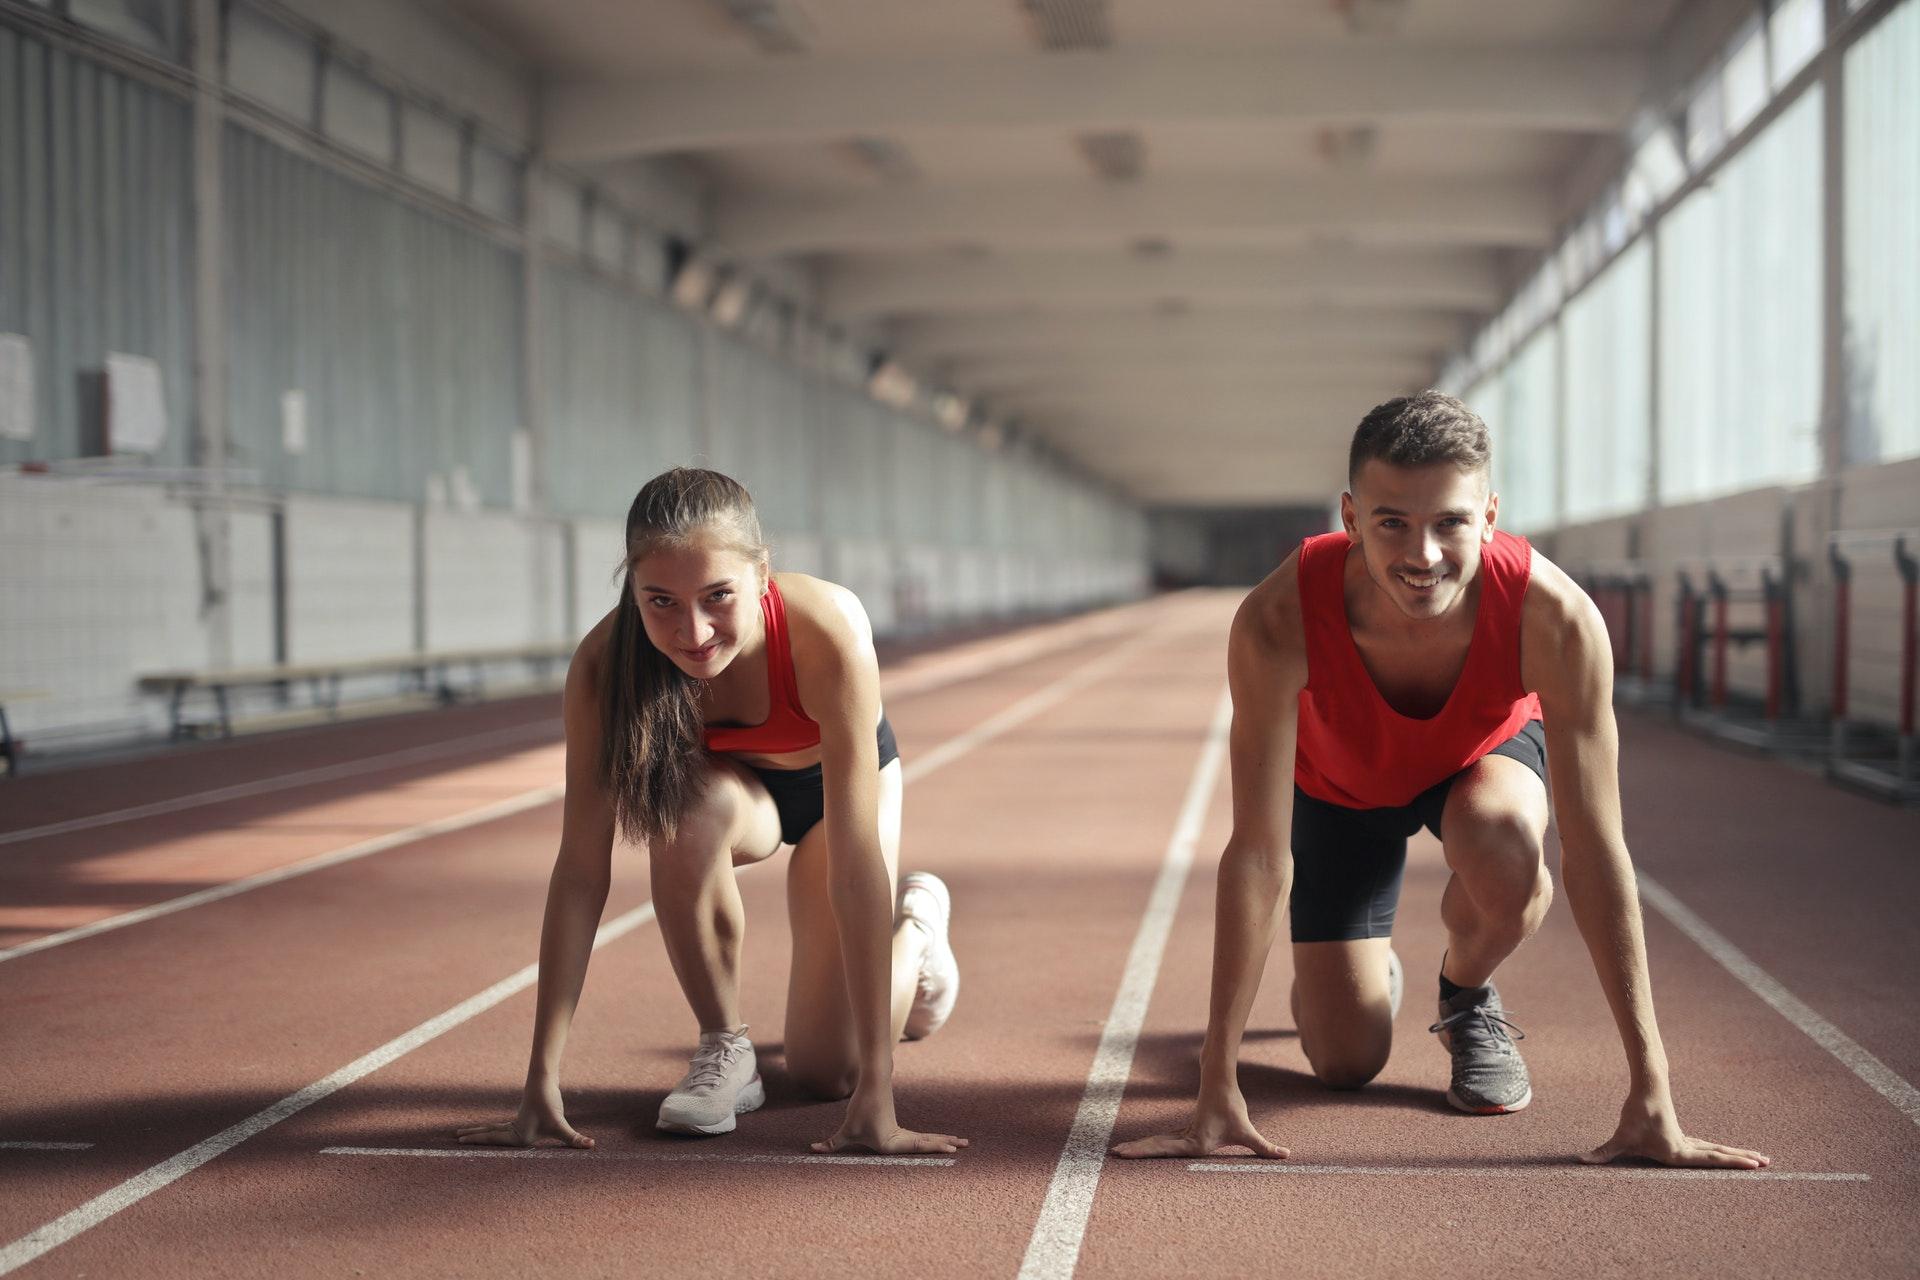 Man en vrouw in sportoutfit maken zich klaar om te gaan lopen in sporthal